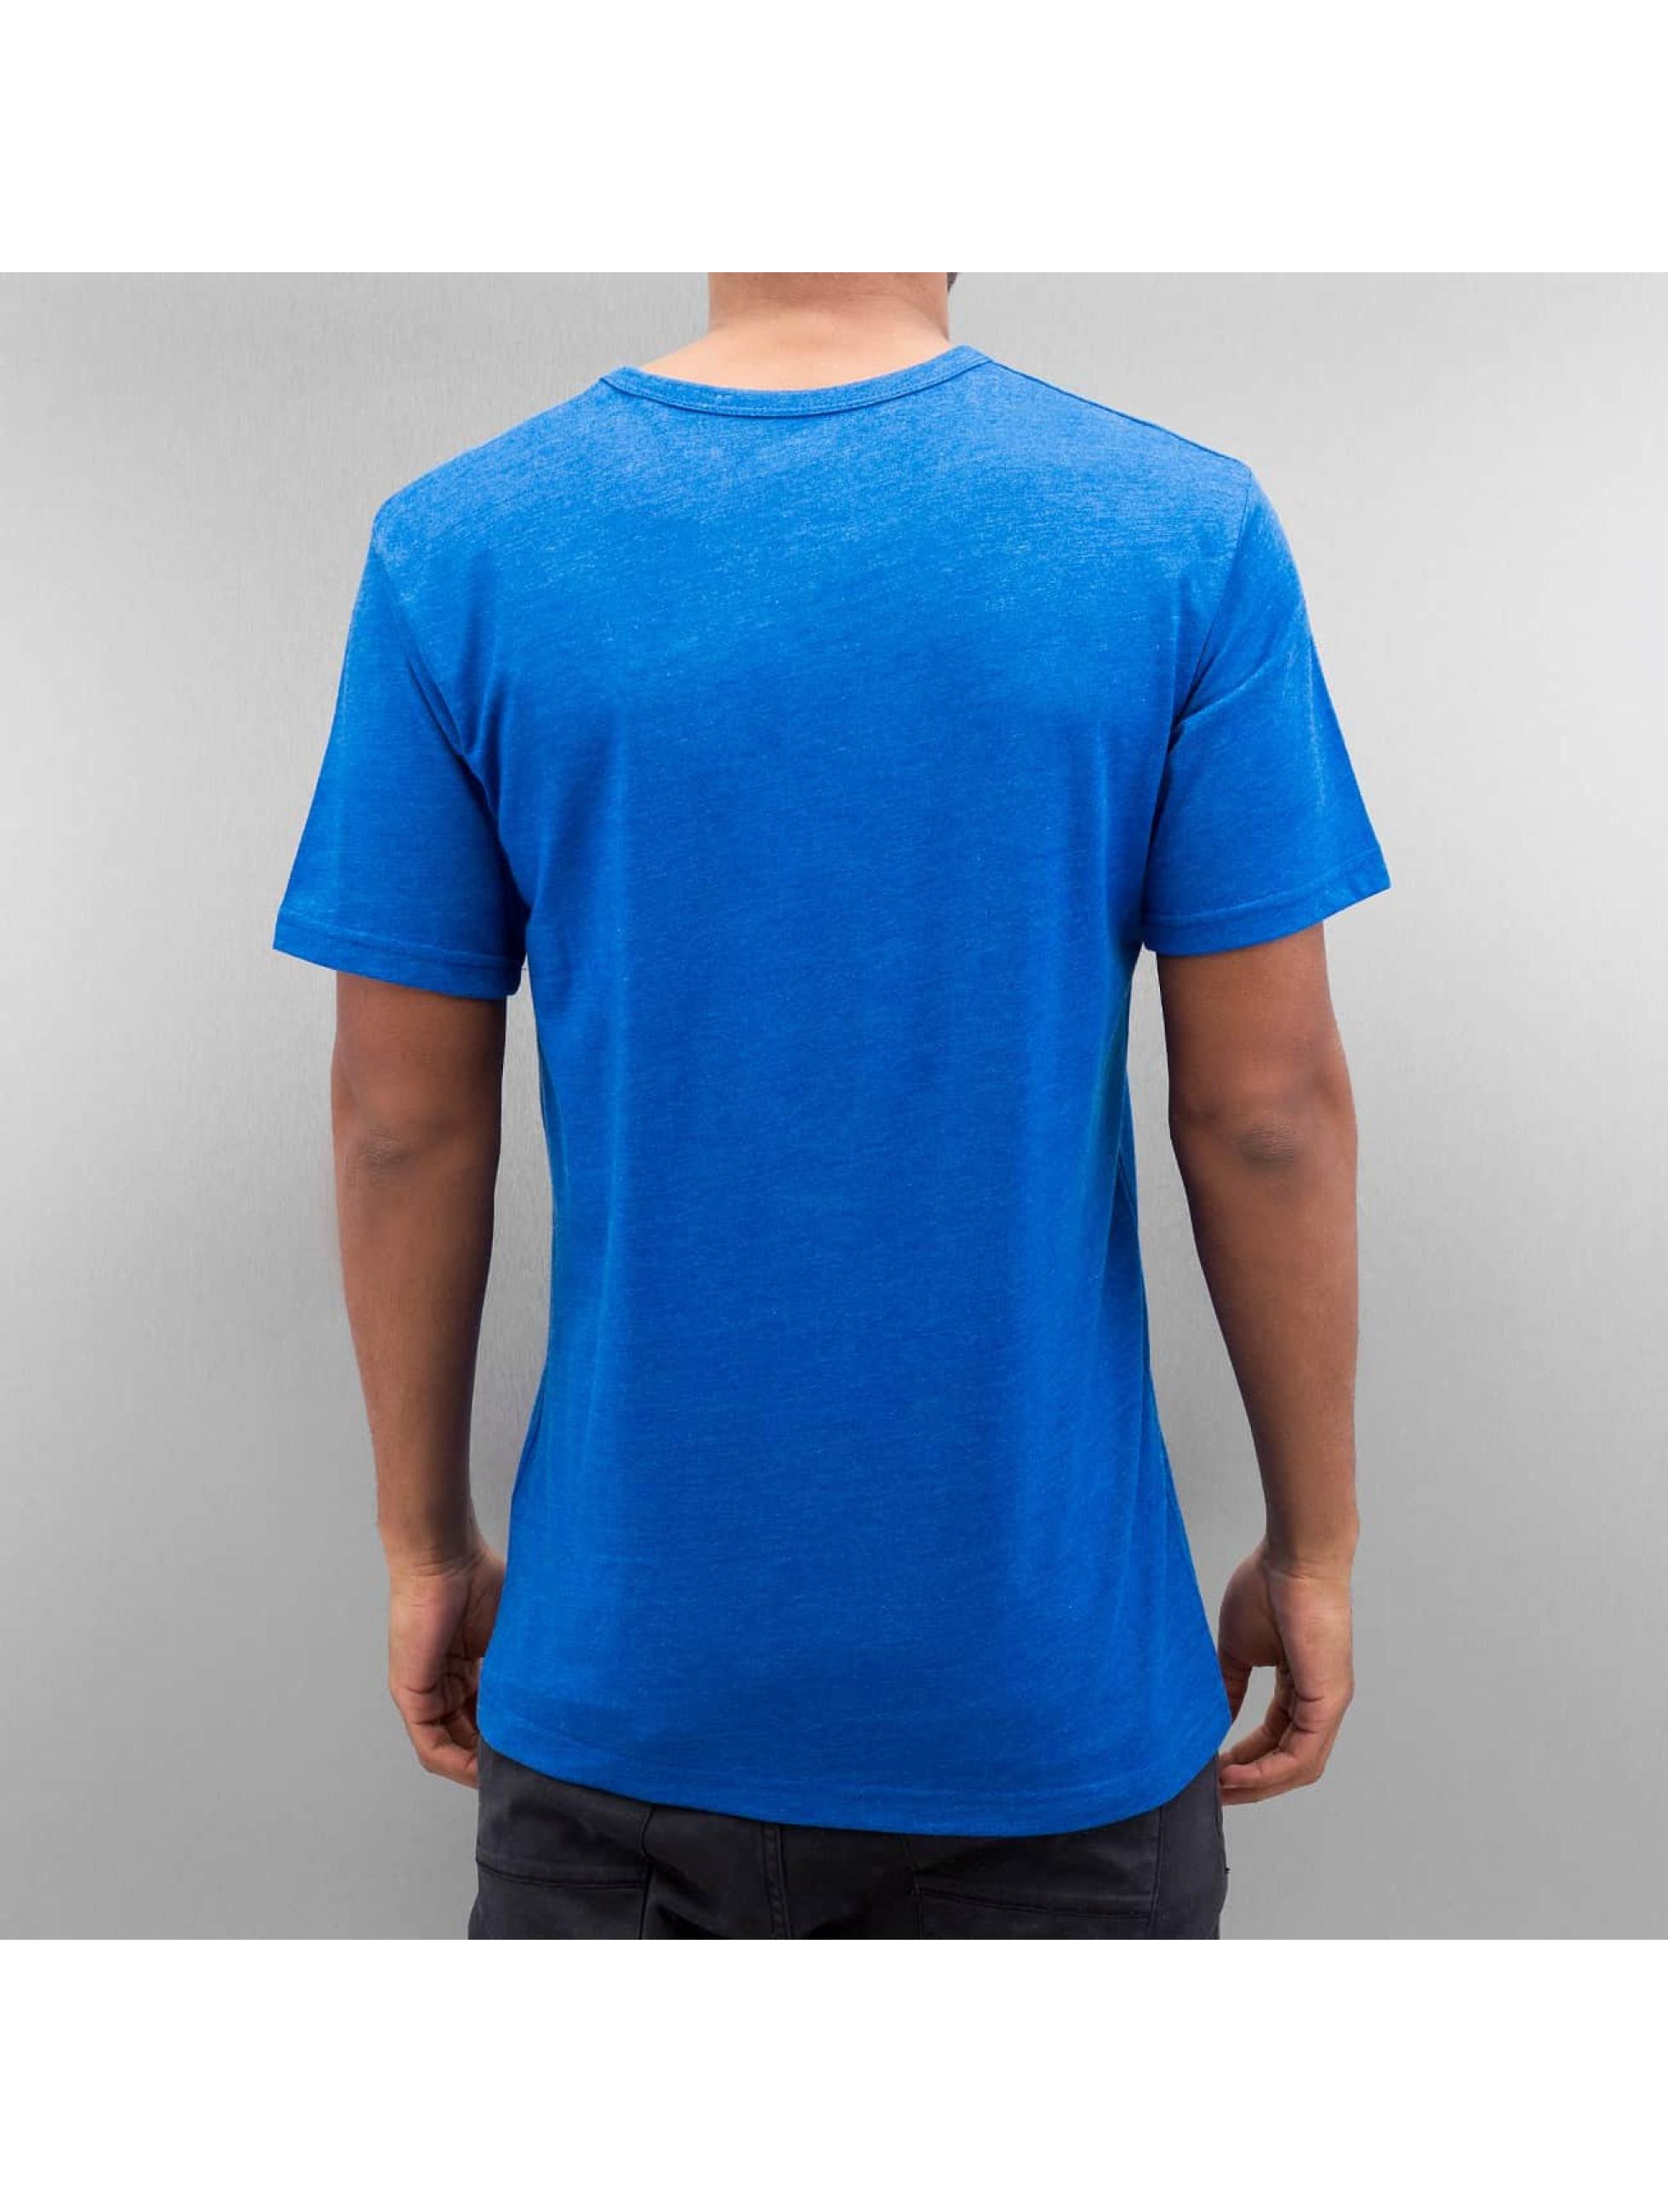 Cyprime T-Shirt Breast Pocket blau